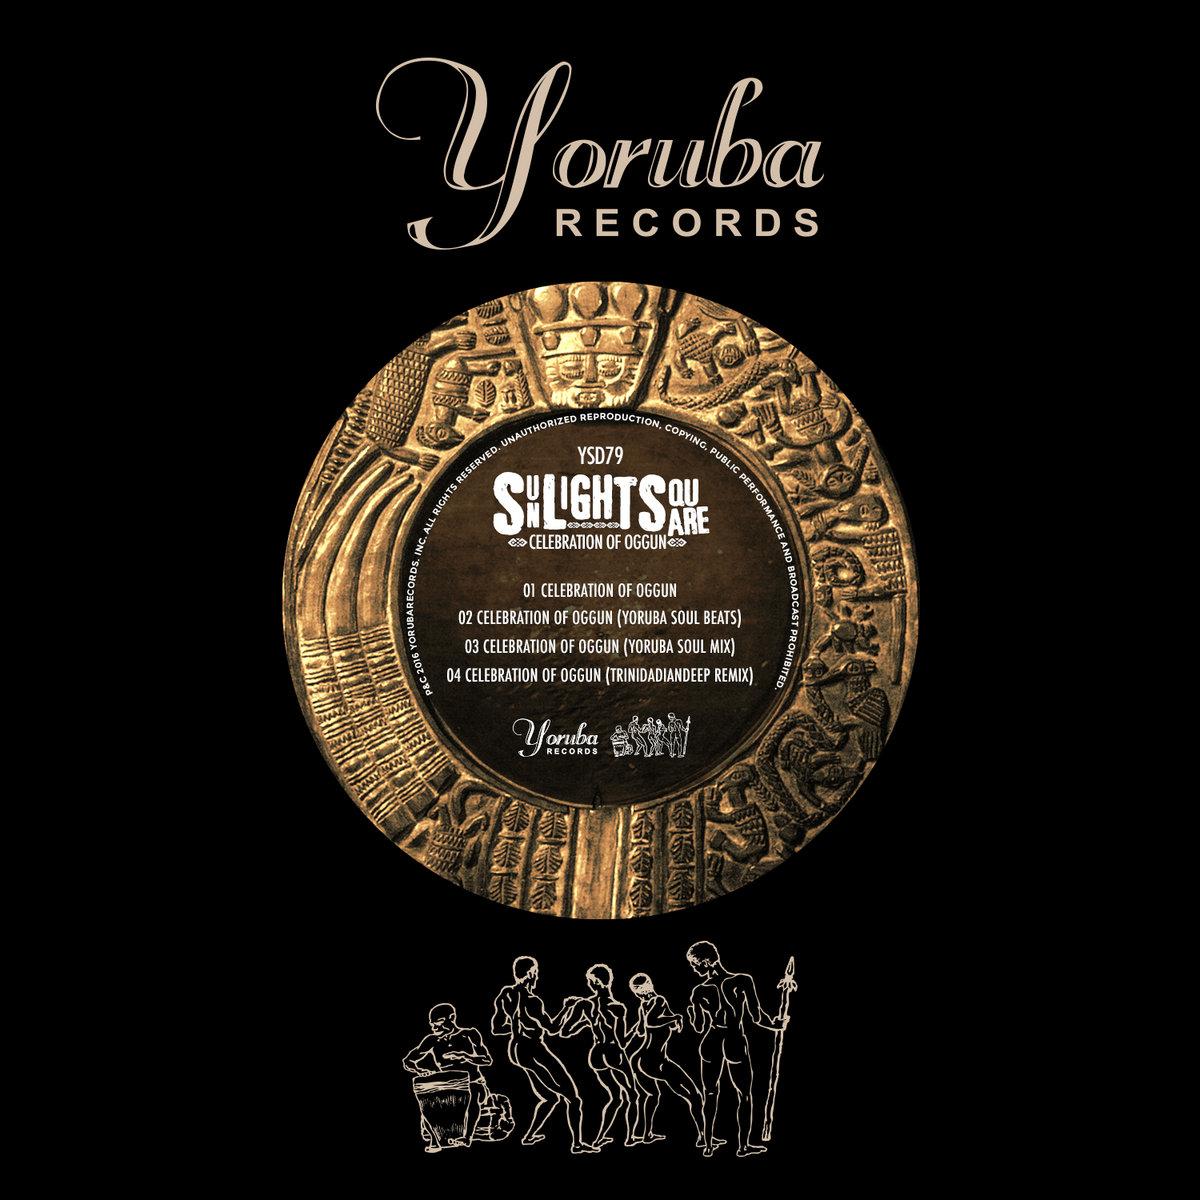 Celebration of Oggun | Yoruba Records